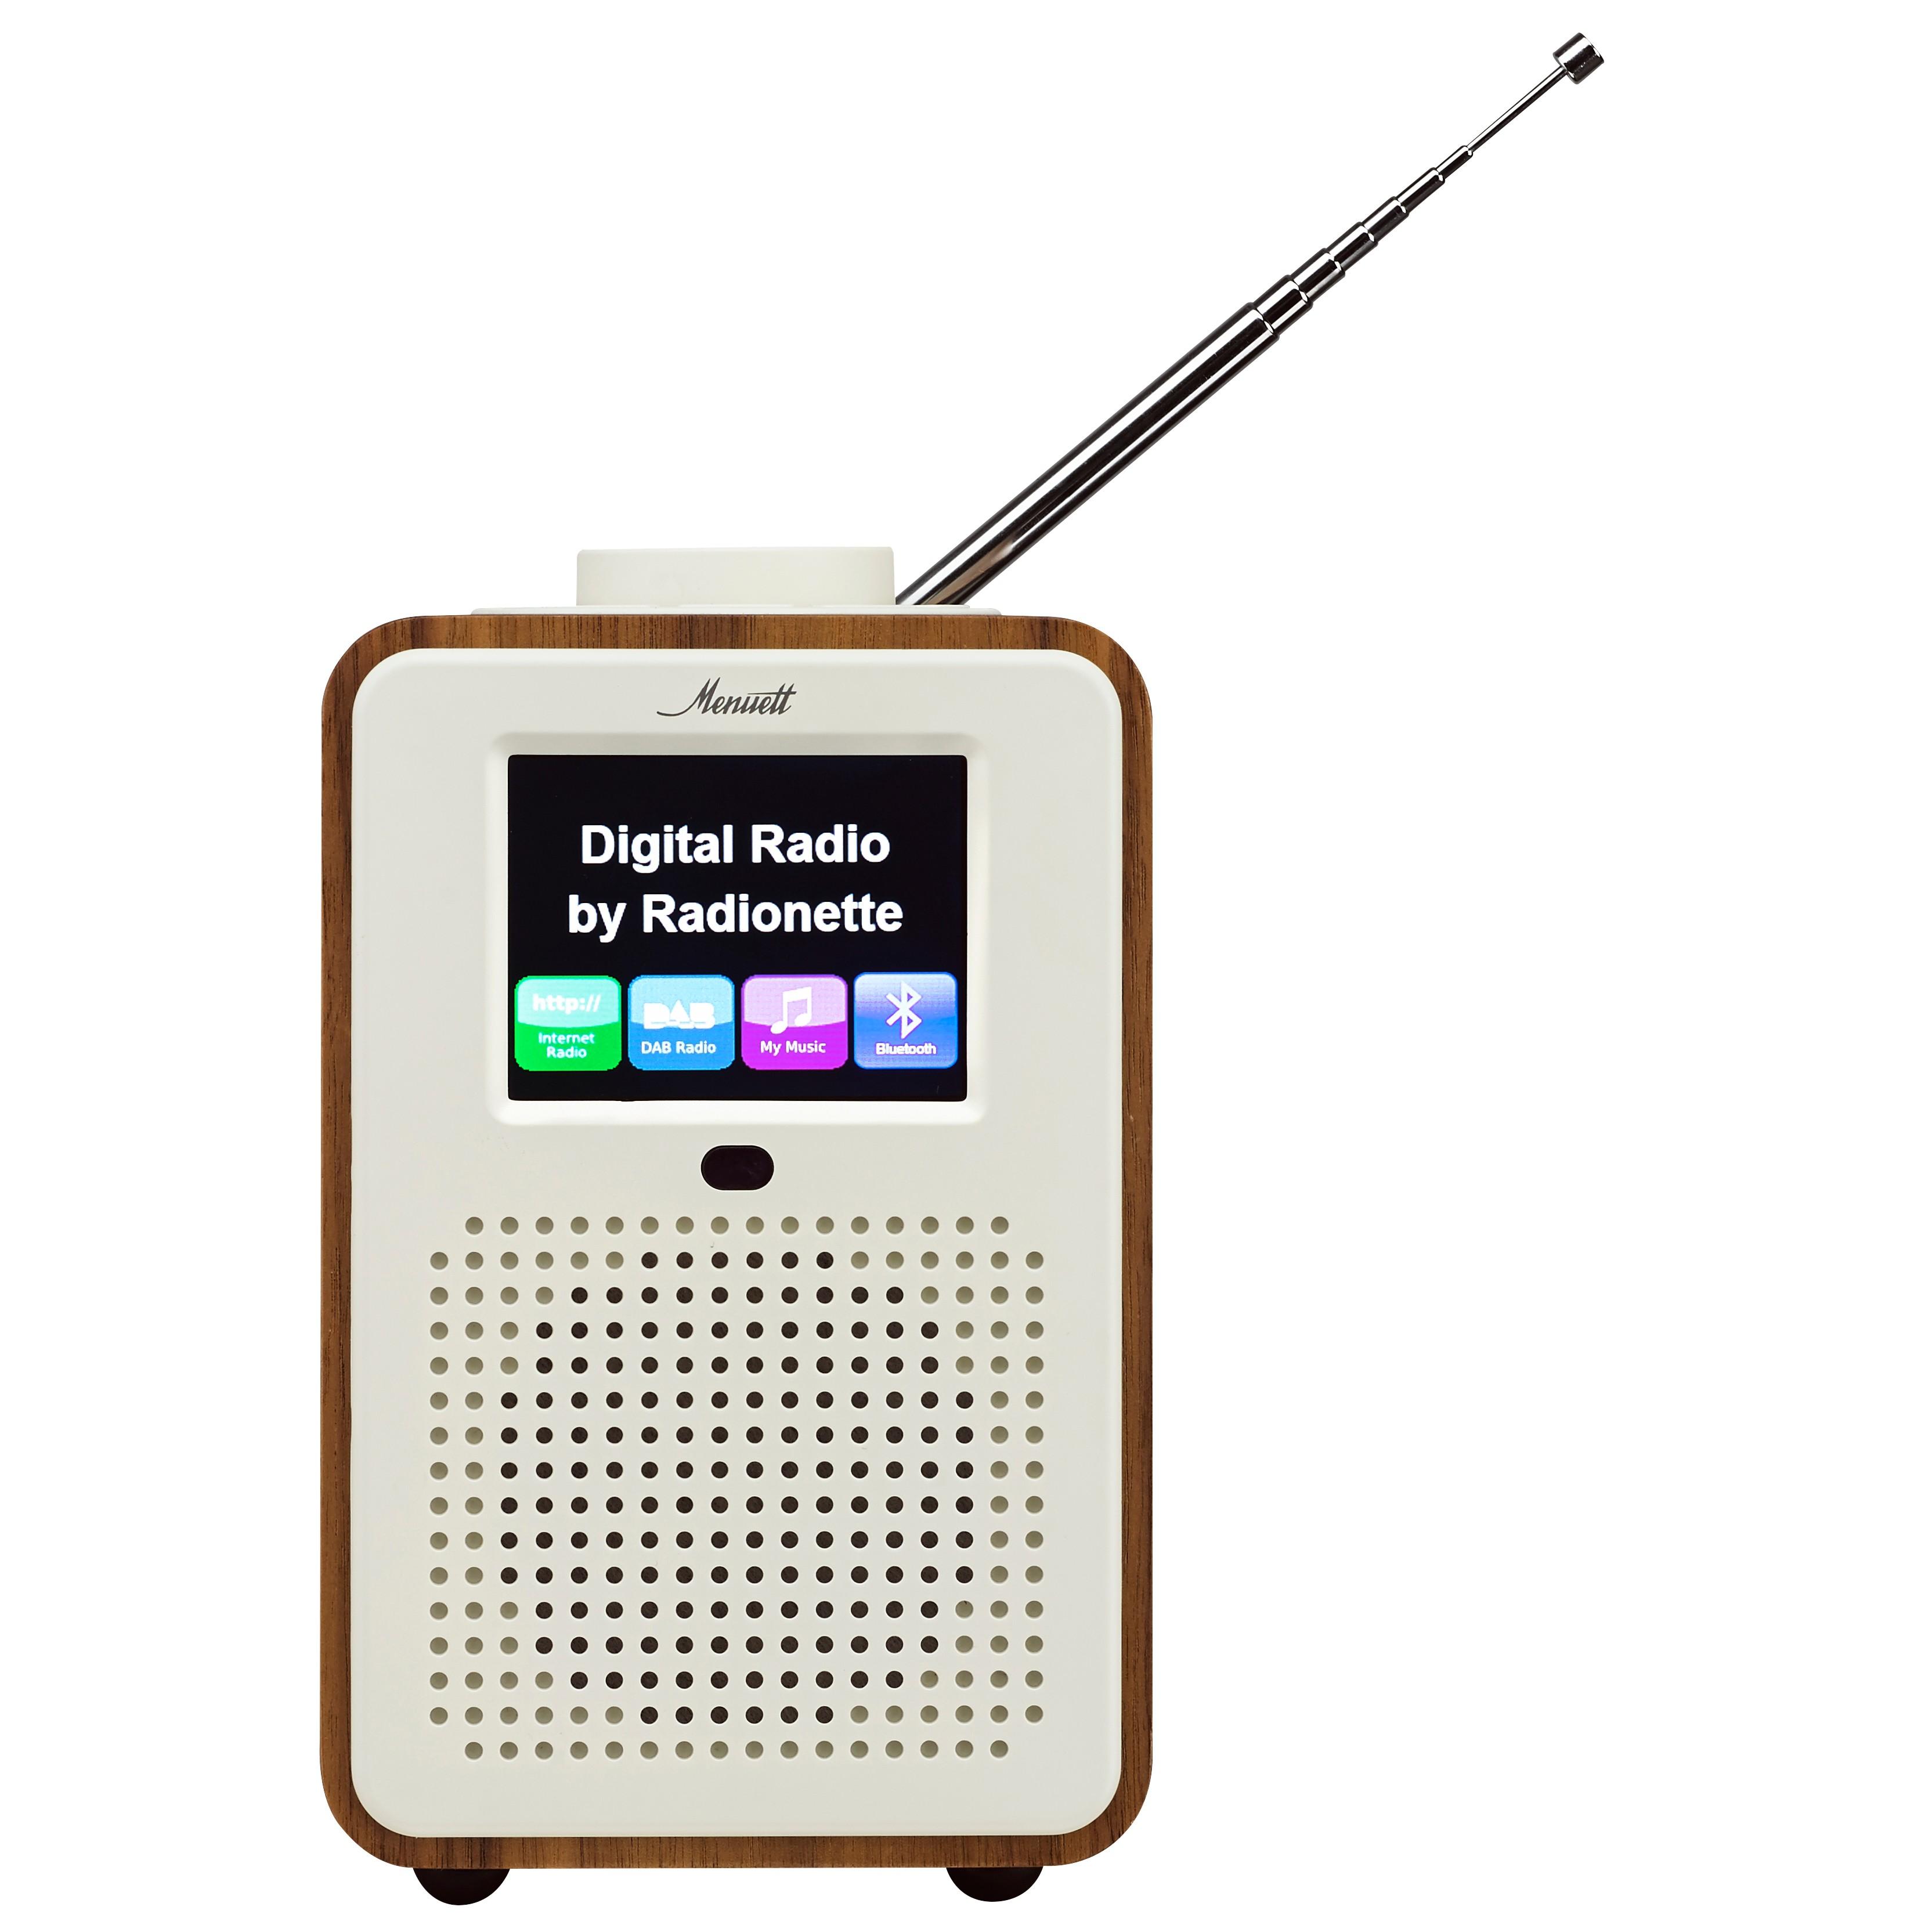 Radionette Menuett radio